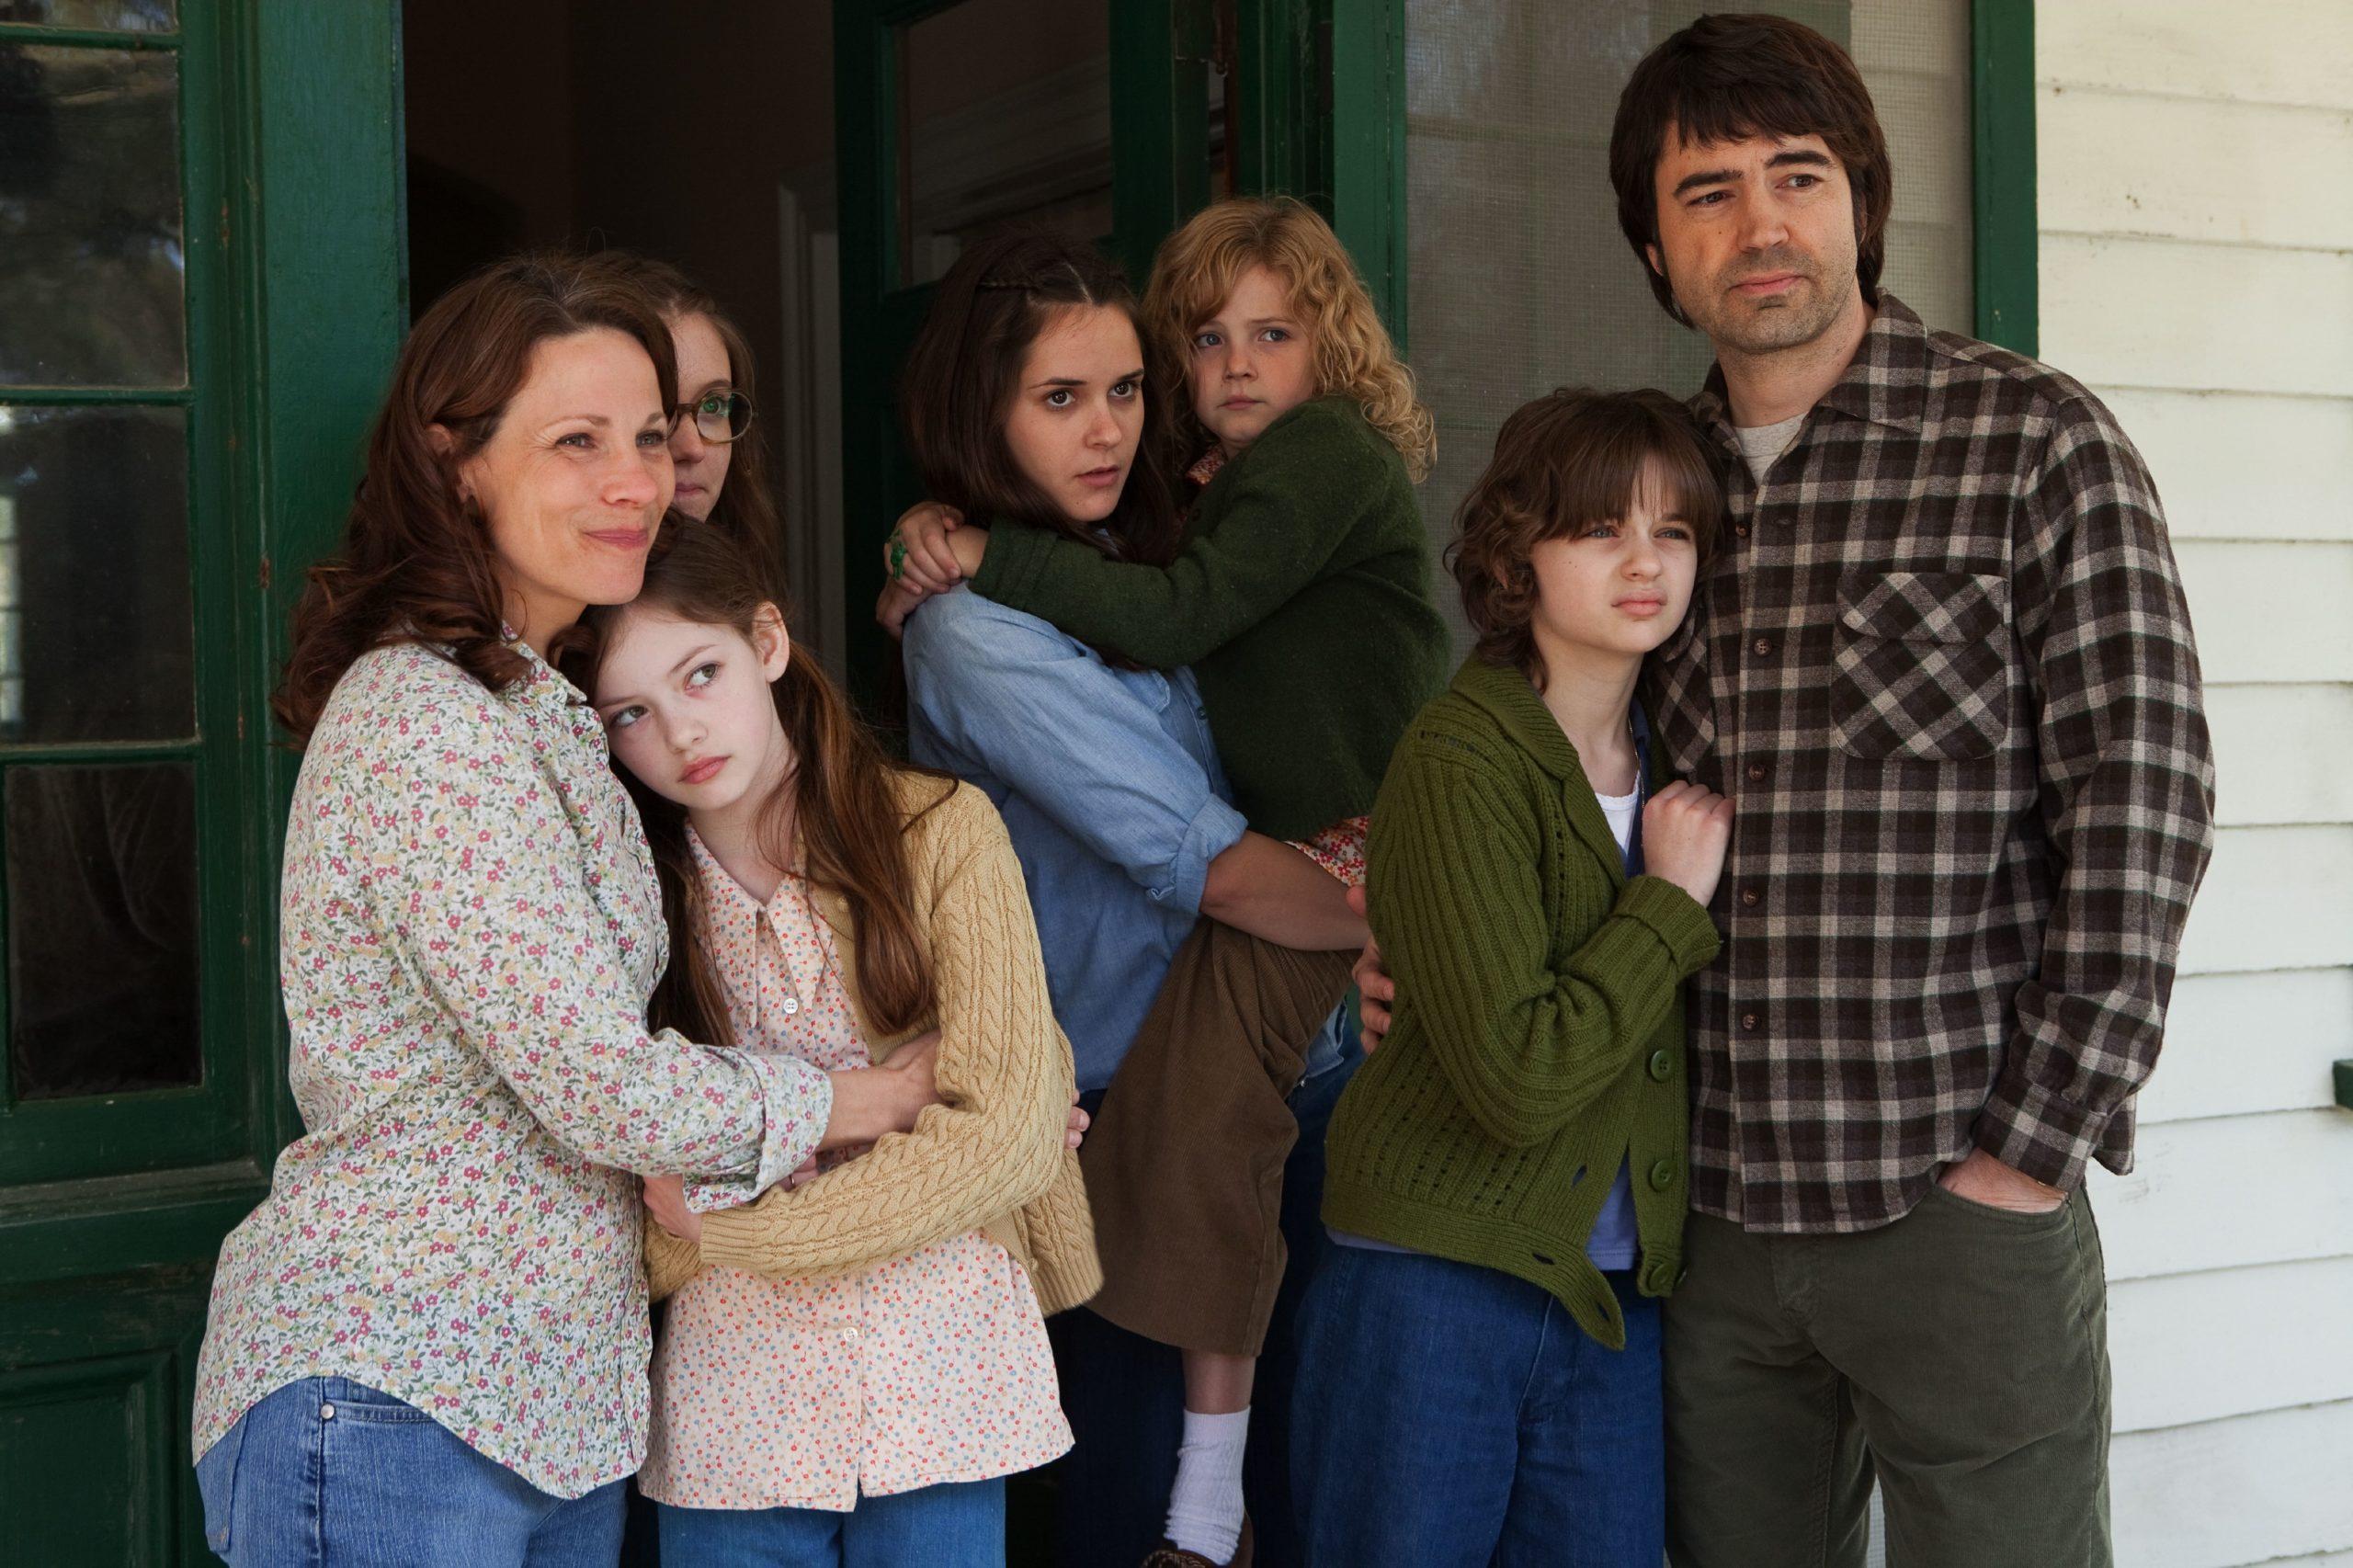 La Veritable Histoire Derriere La Famille Perron Du Film The Conjuring Darkmovies